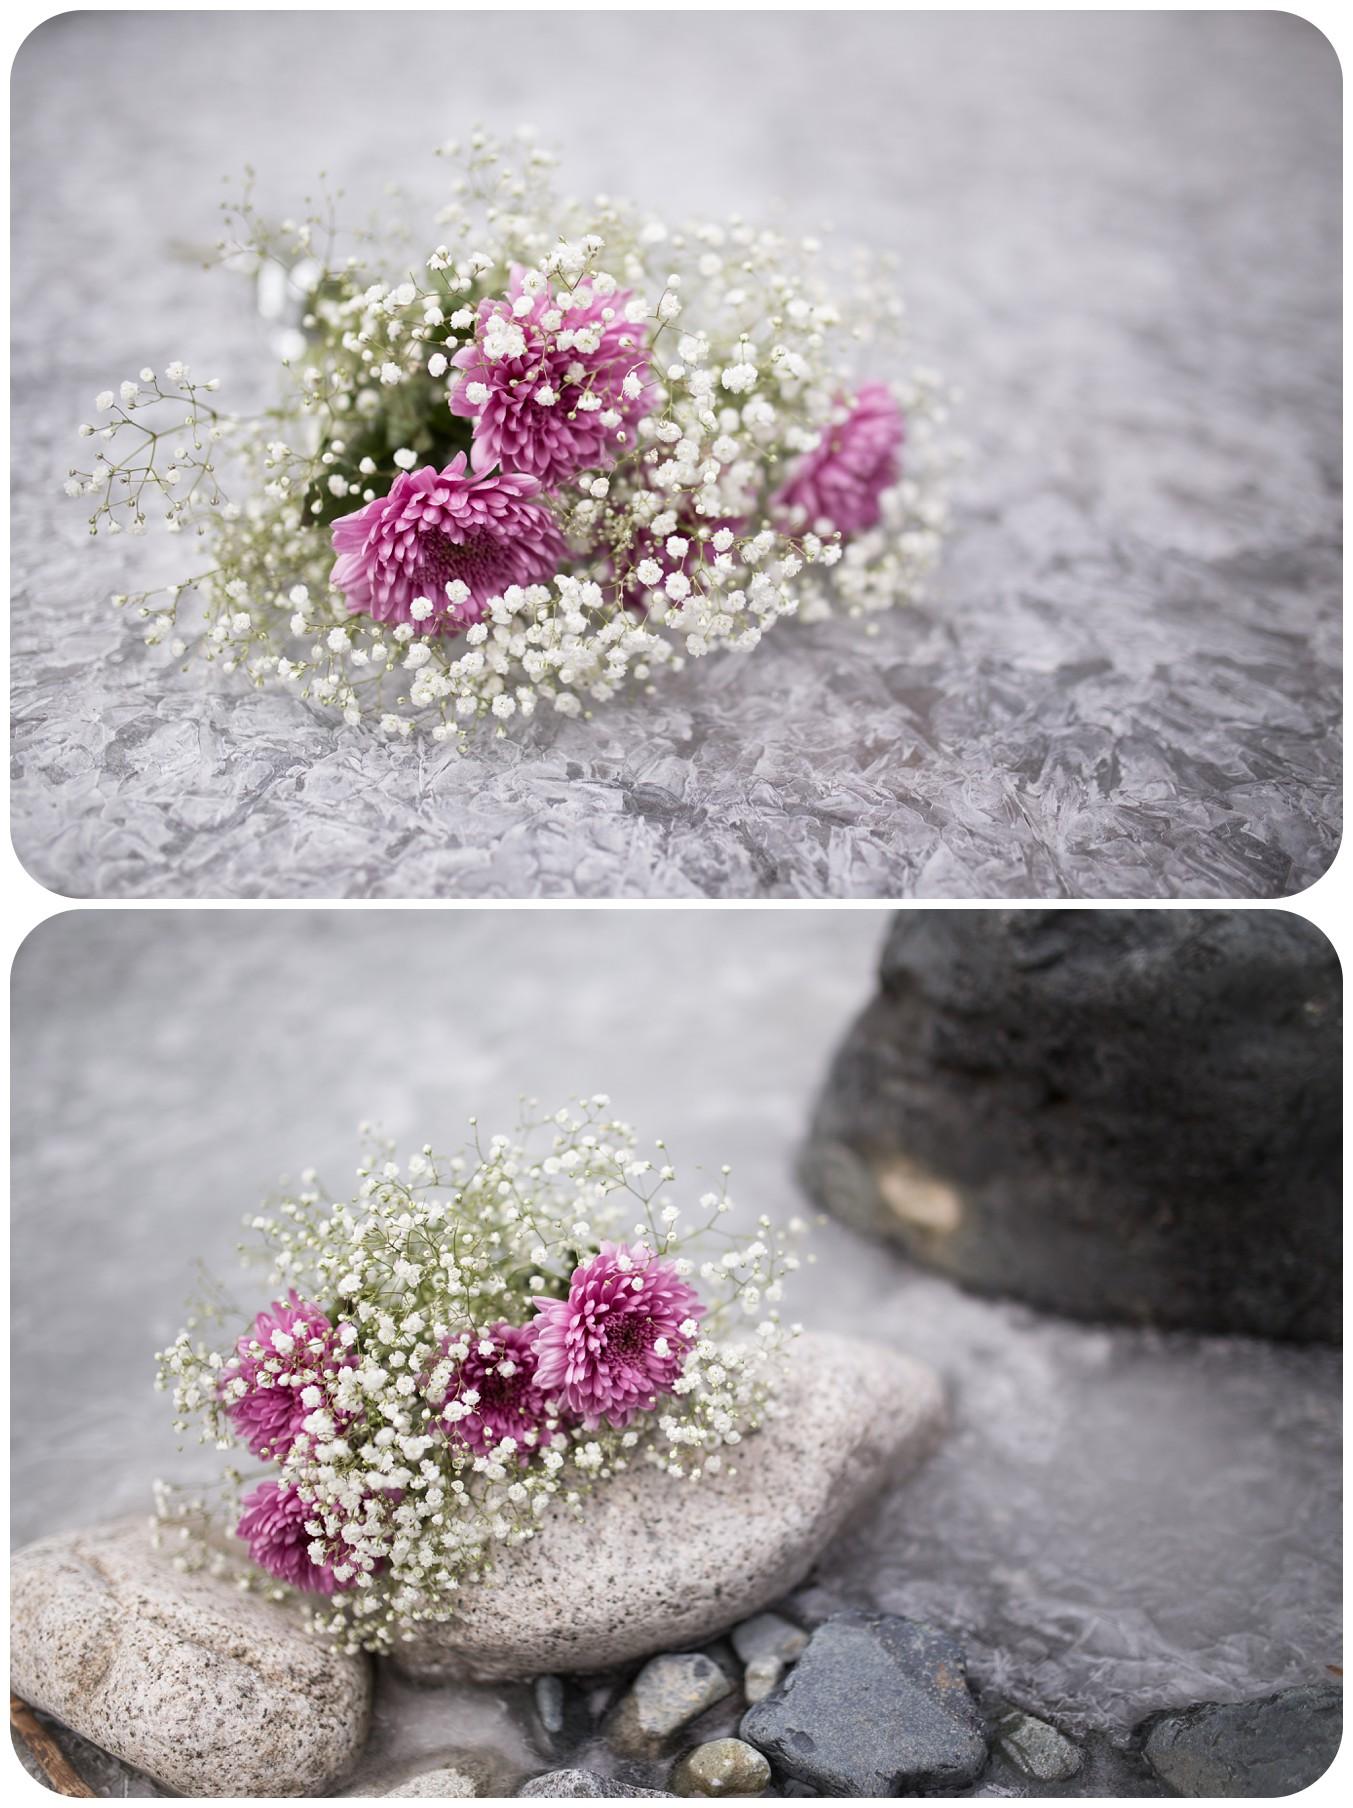 DIY babys breath wedding bouquet, bridal bouquet on ice, romantic bouquet photos, wedding details, parksville bc wedding photographer